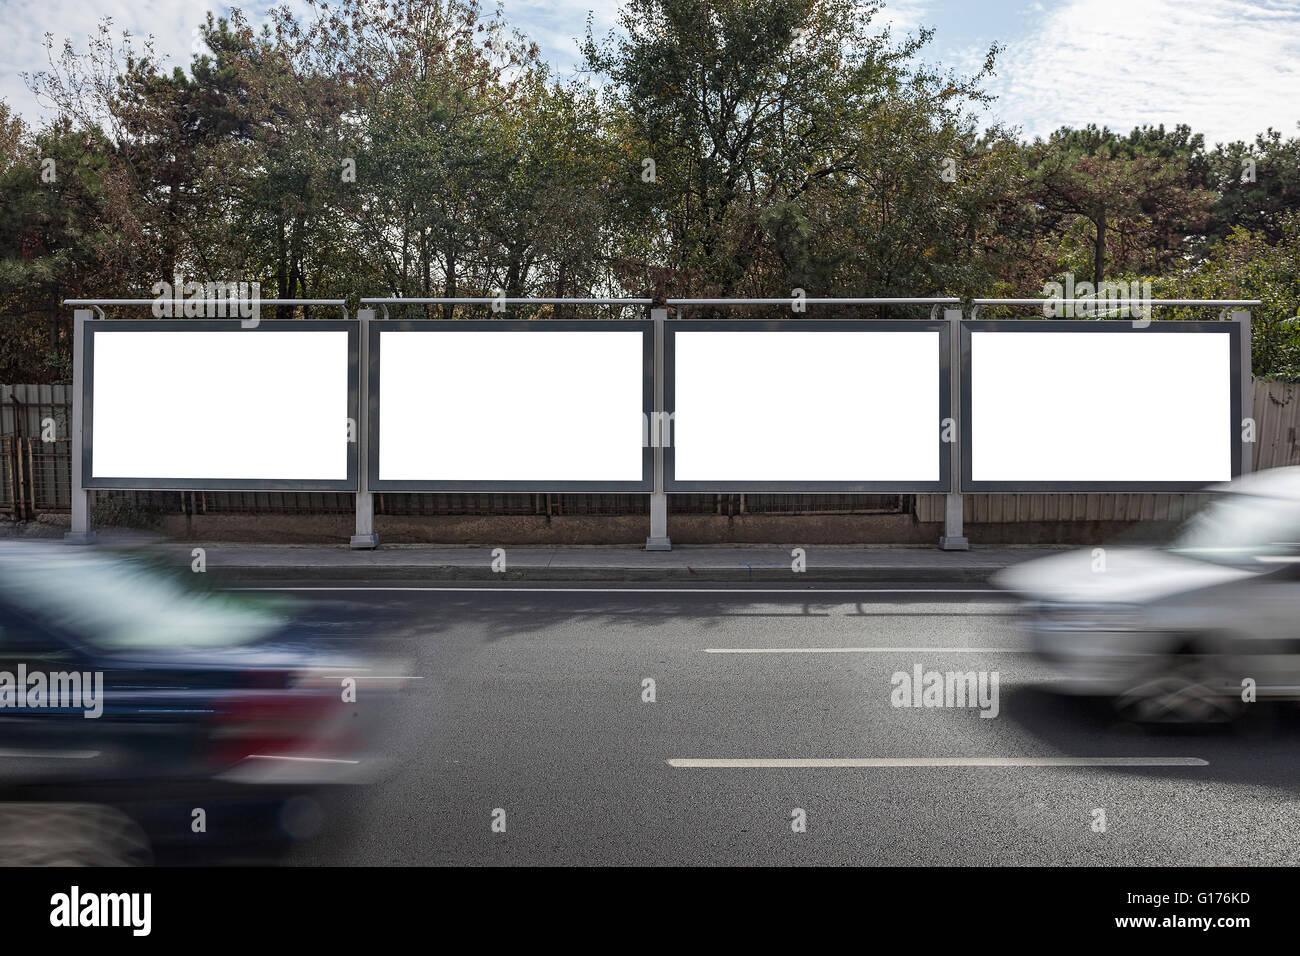 Billboards - Stock Image